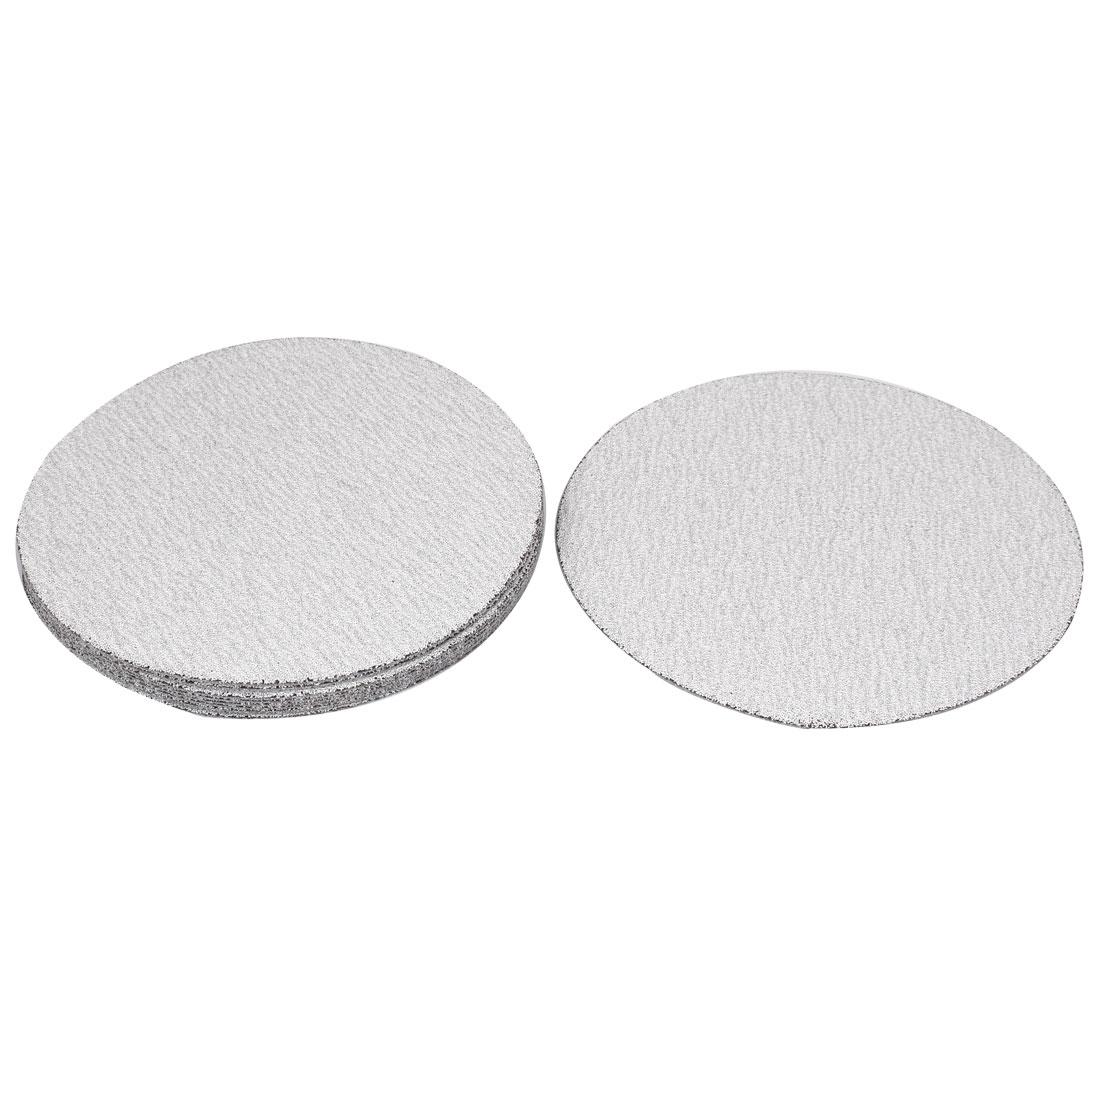 7inch Dia Round Dry Abrasive Sanding Flocking Sandpaper Disc 80 Grit 10pcs